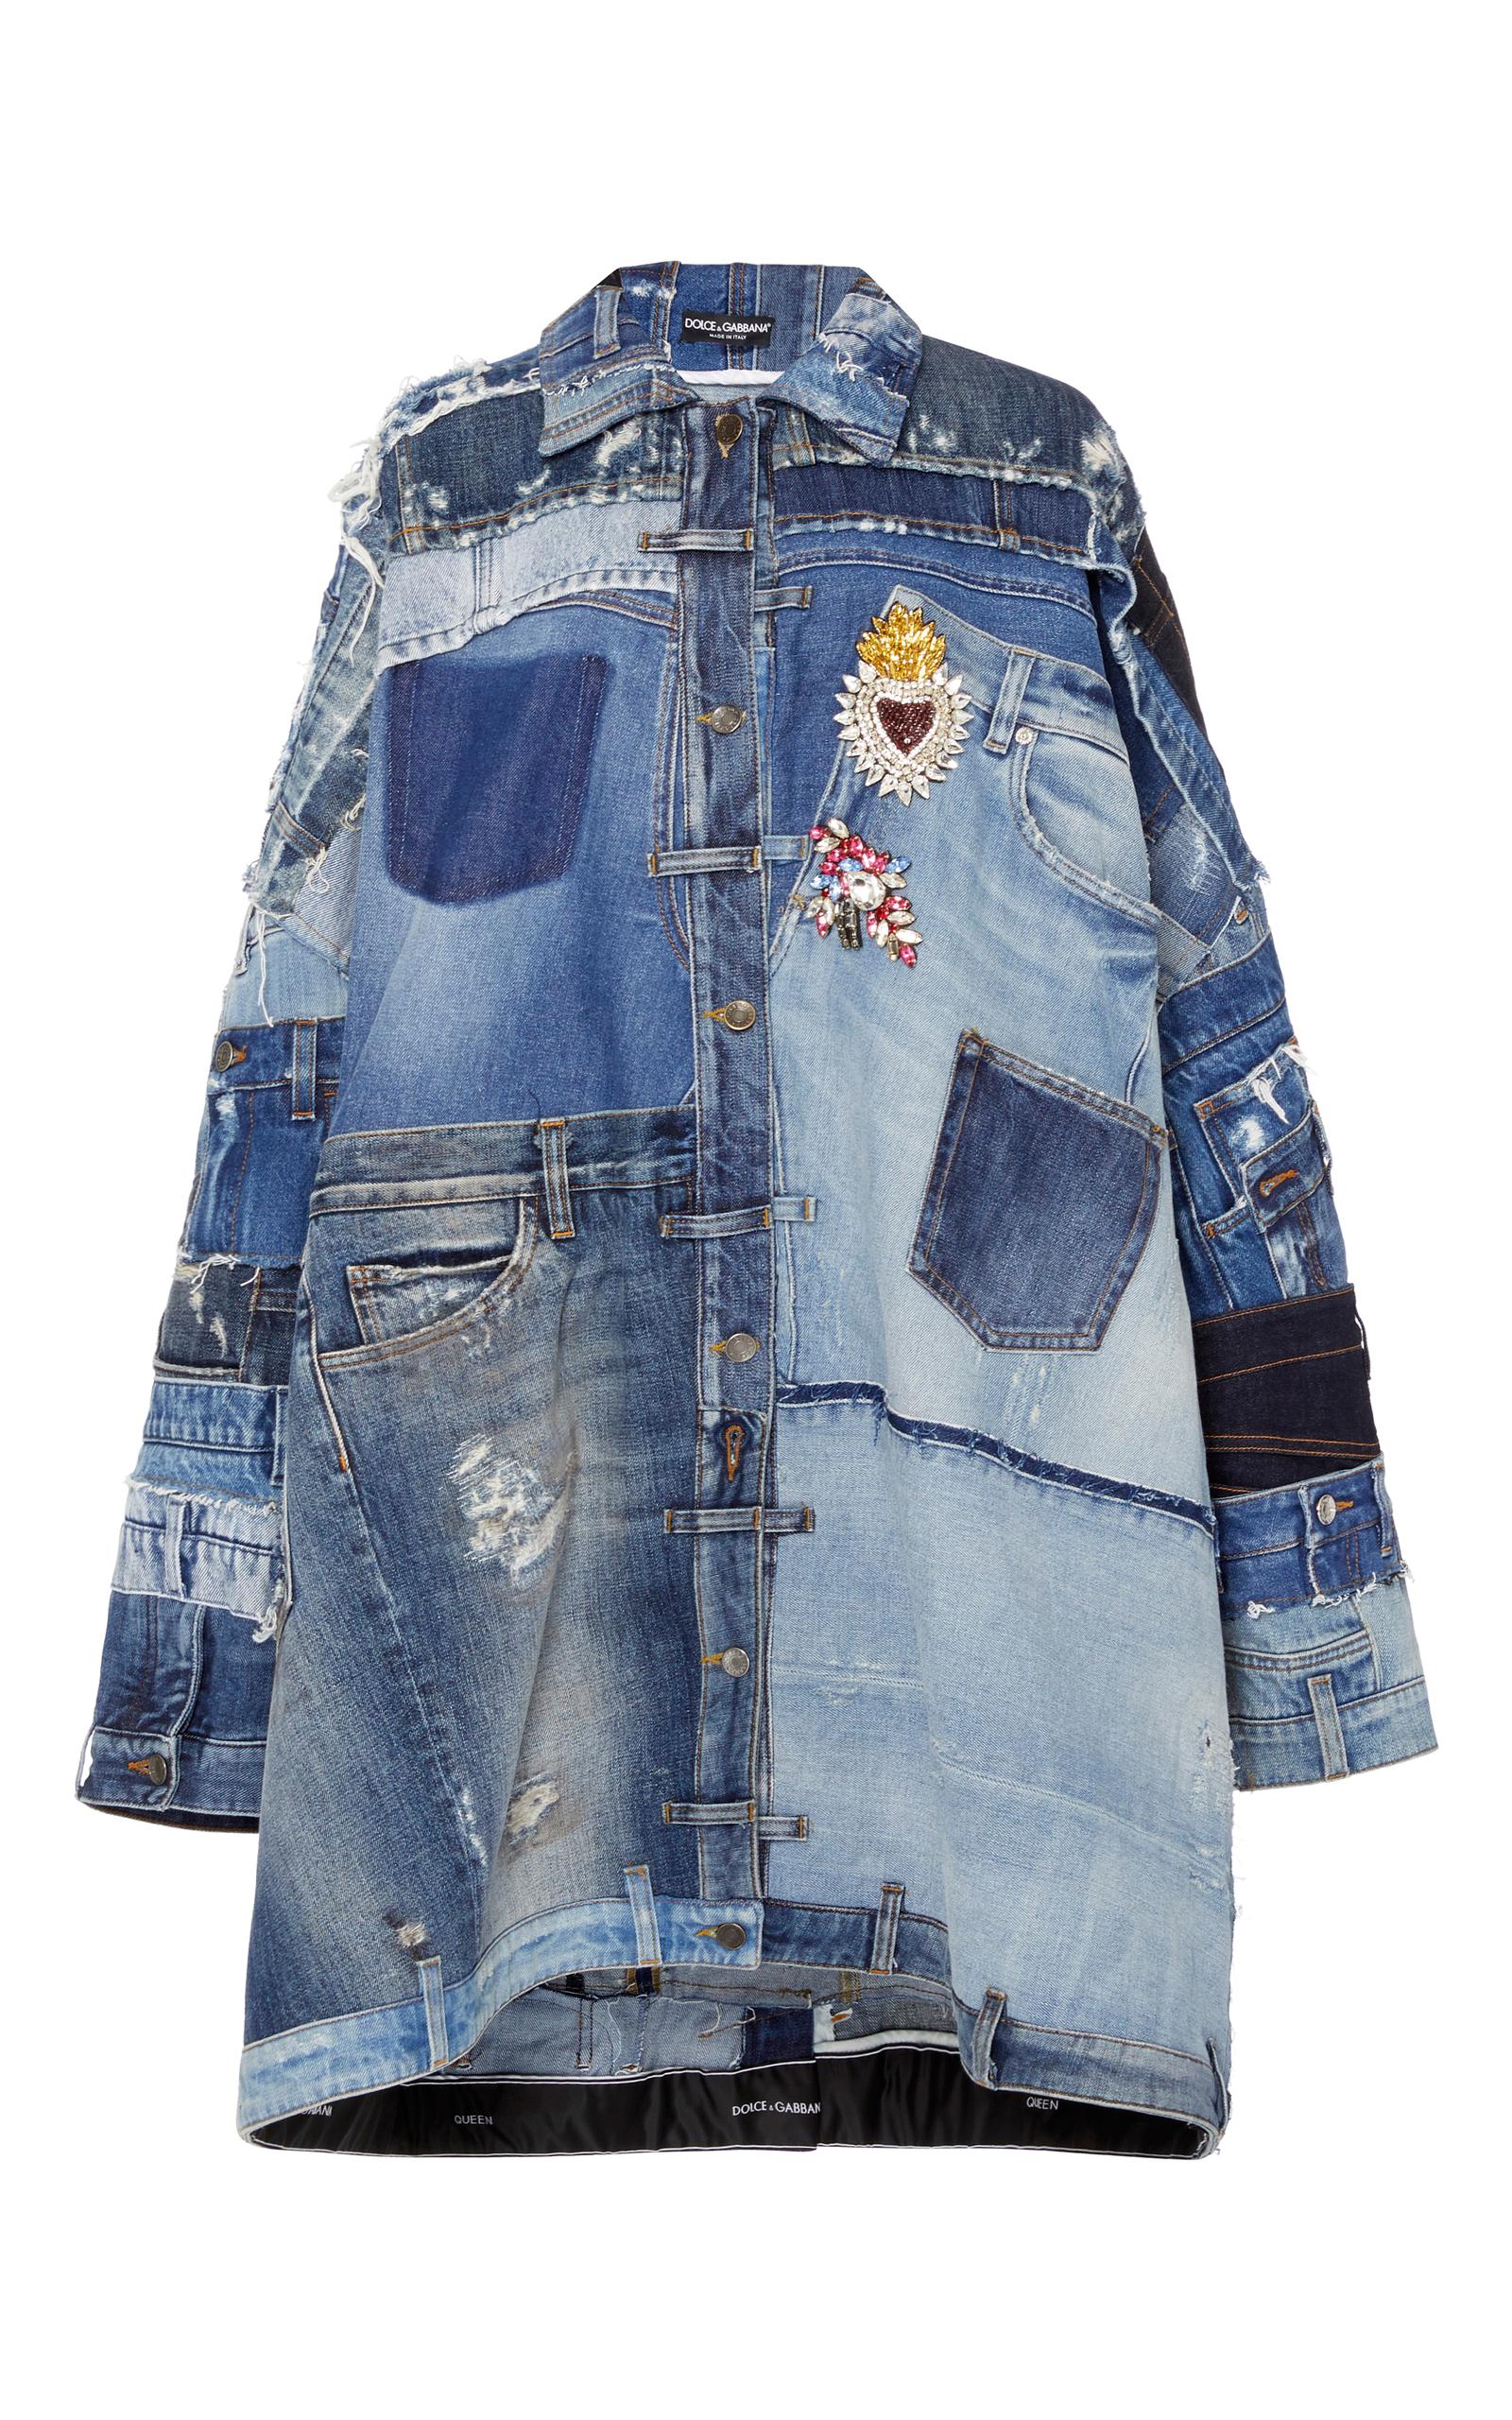 Patchwork Denim Jacket by Dolce  Gabbana  Moda Operandi